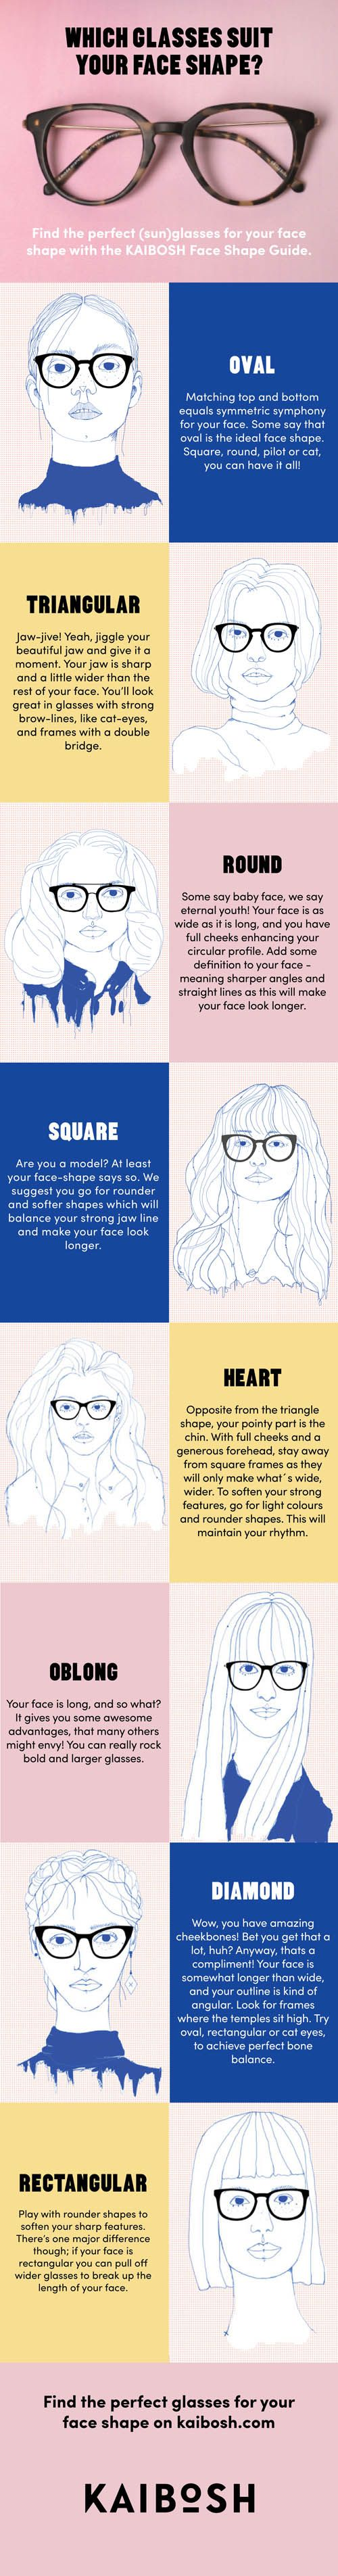 KAIBOSH Face Shape Guide for Glasses Shop glasses now